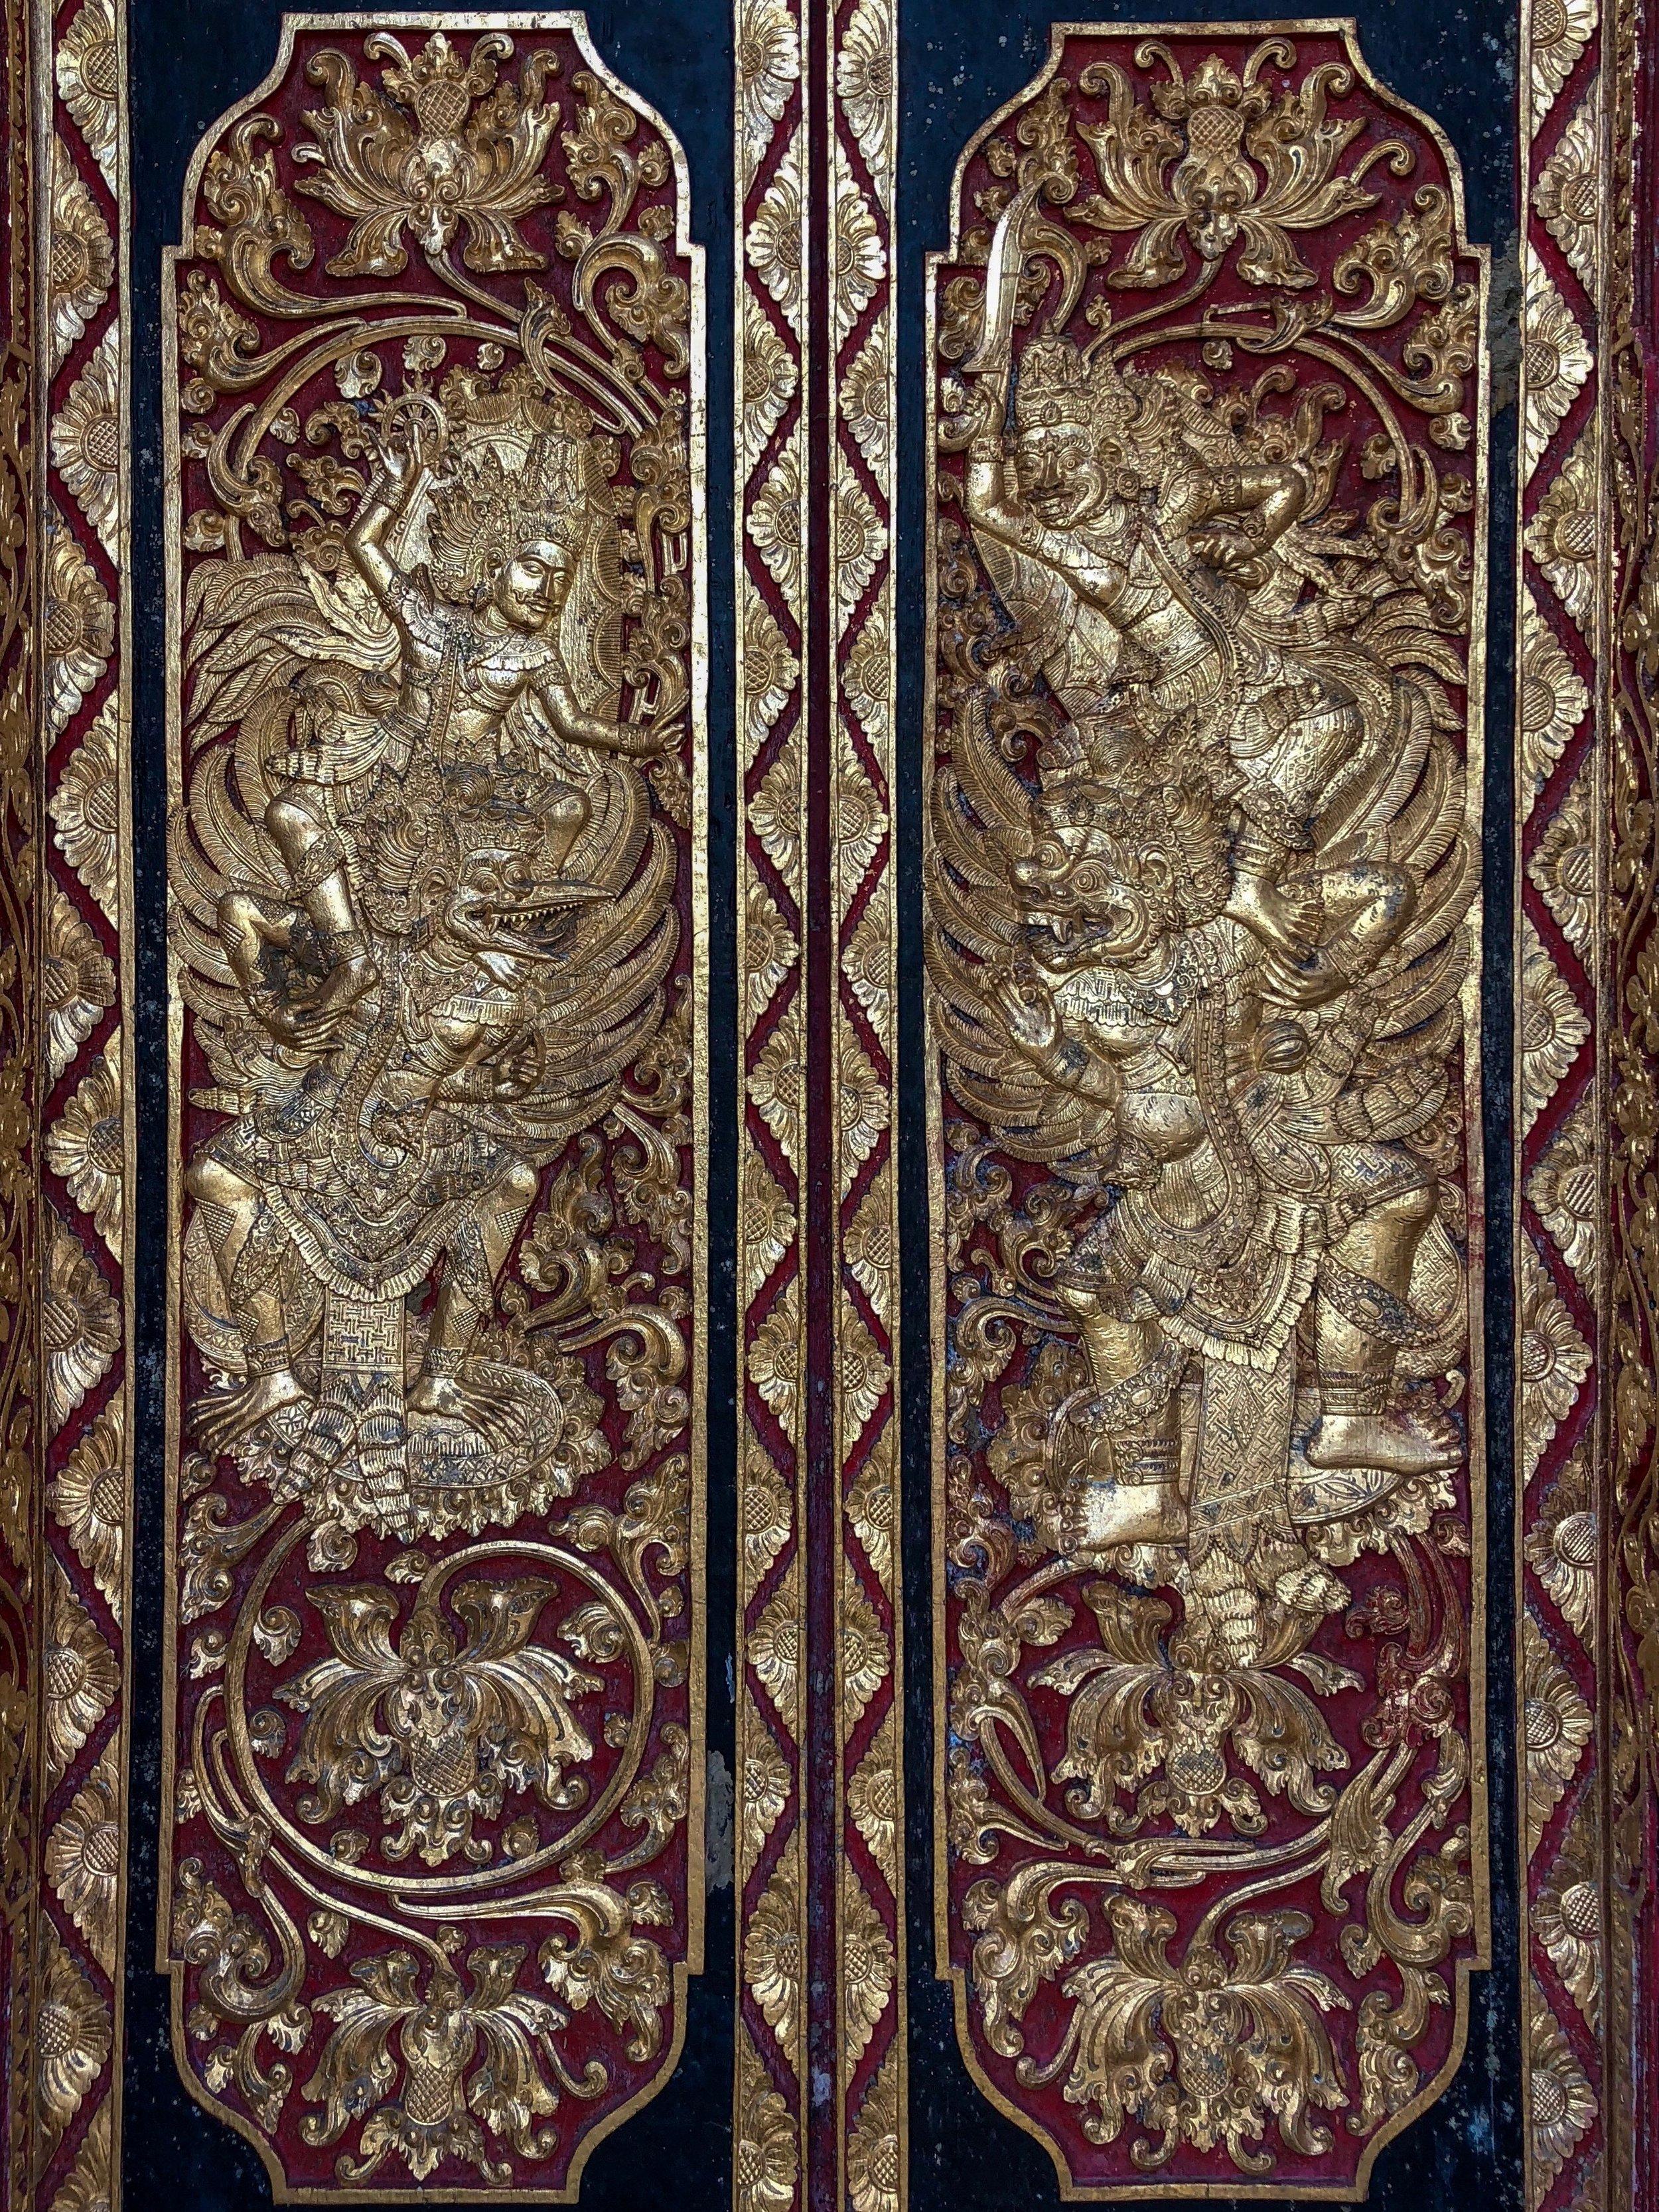 The door detail on the entrance gate shows the god Vishnu, riding his eagle mount Garuda and battling a pair of  rakshasa  demons